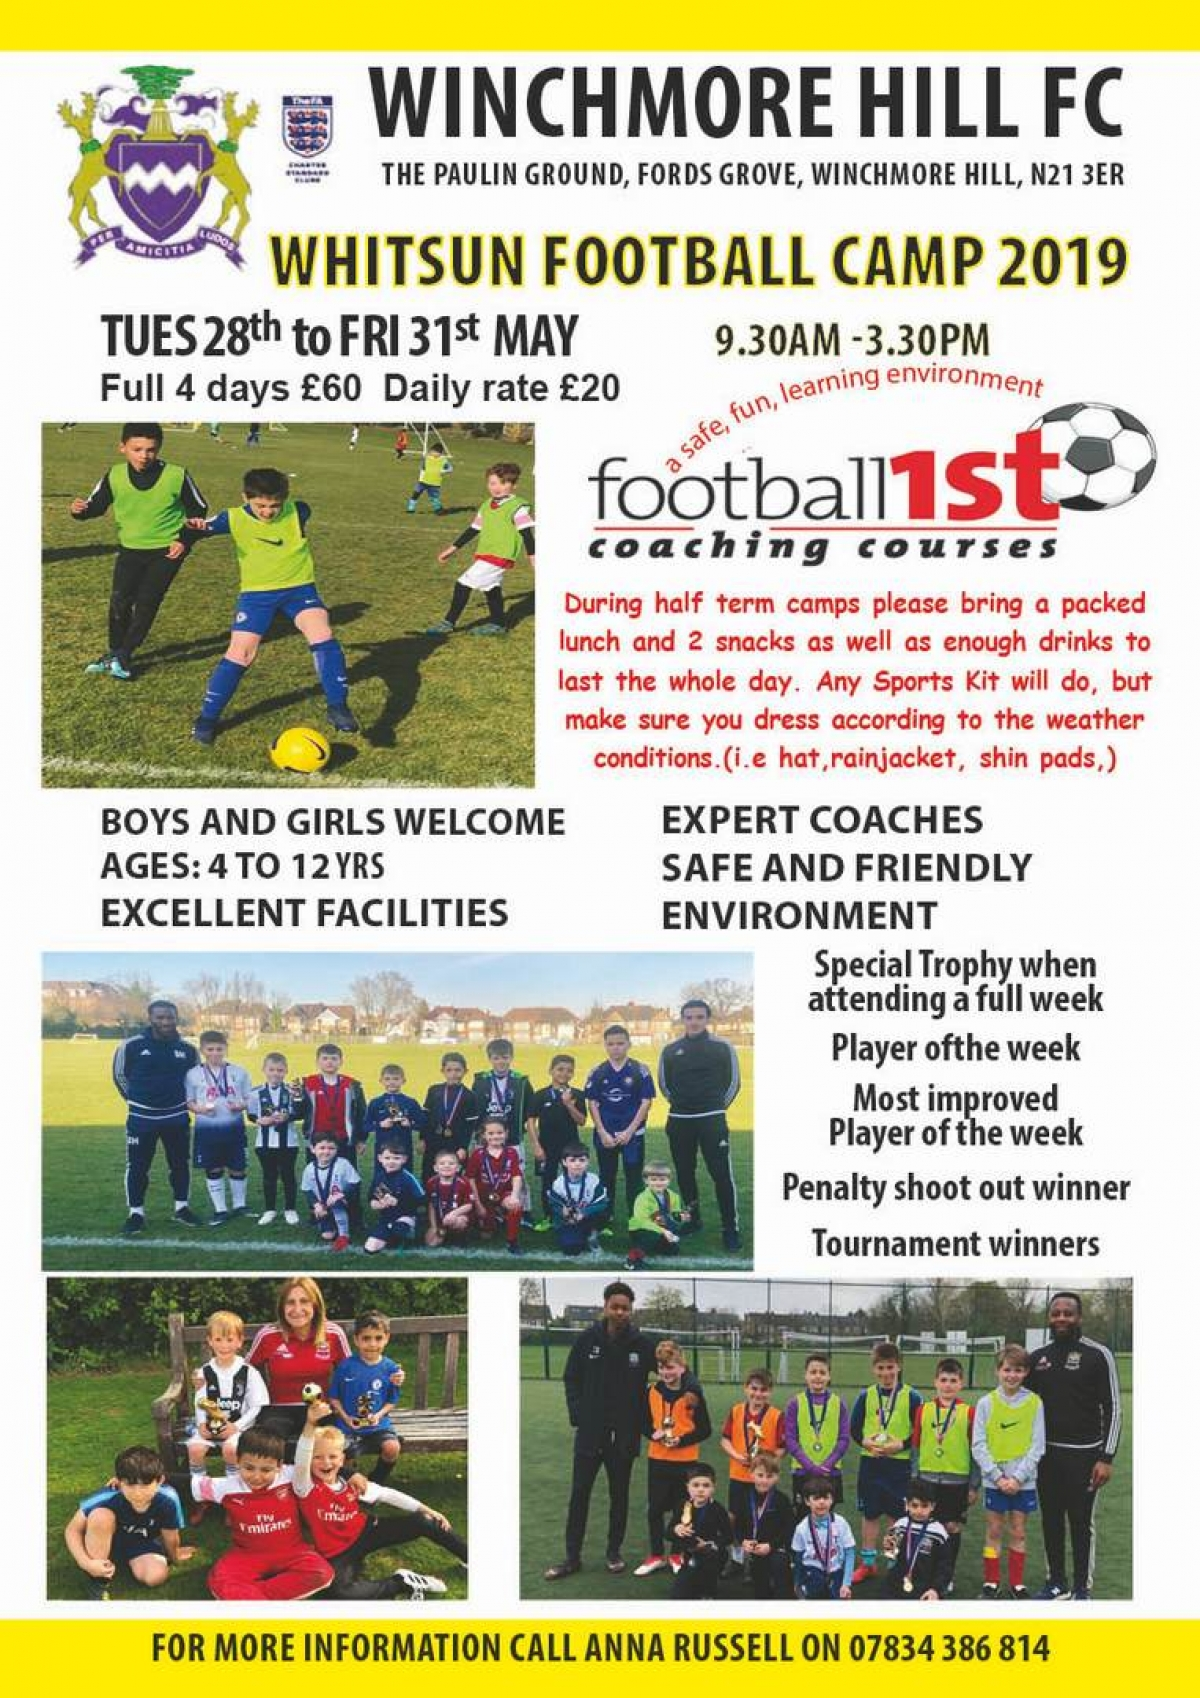 Whitsun 2019 Football Camps